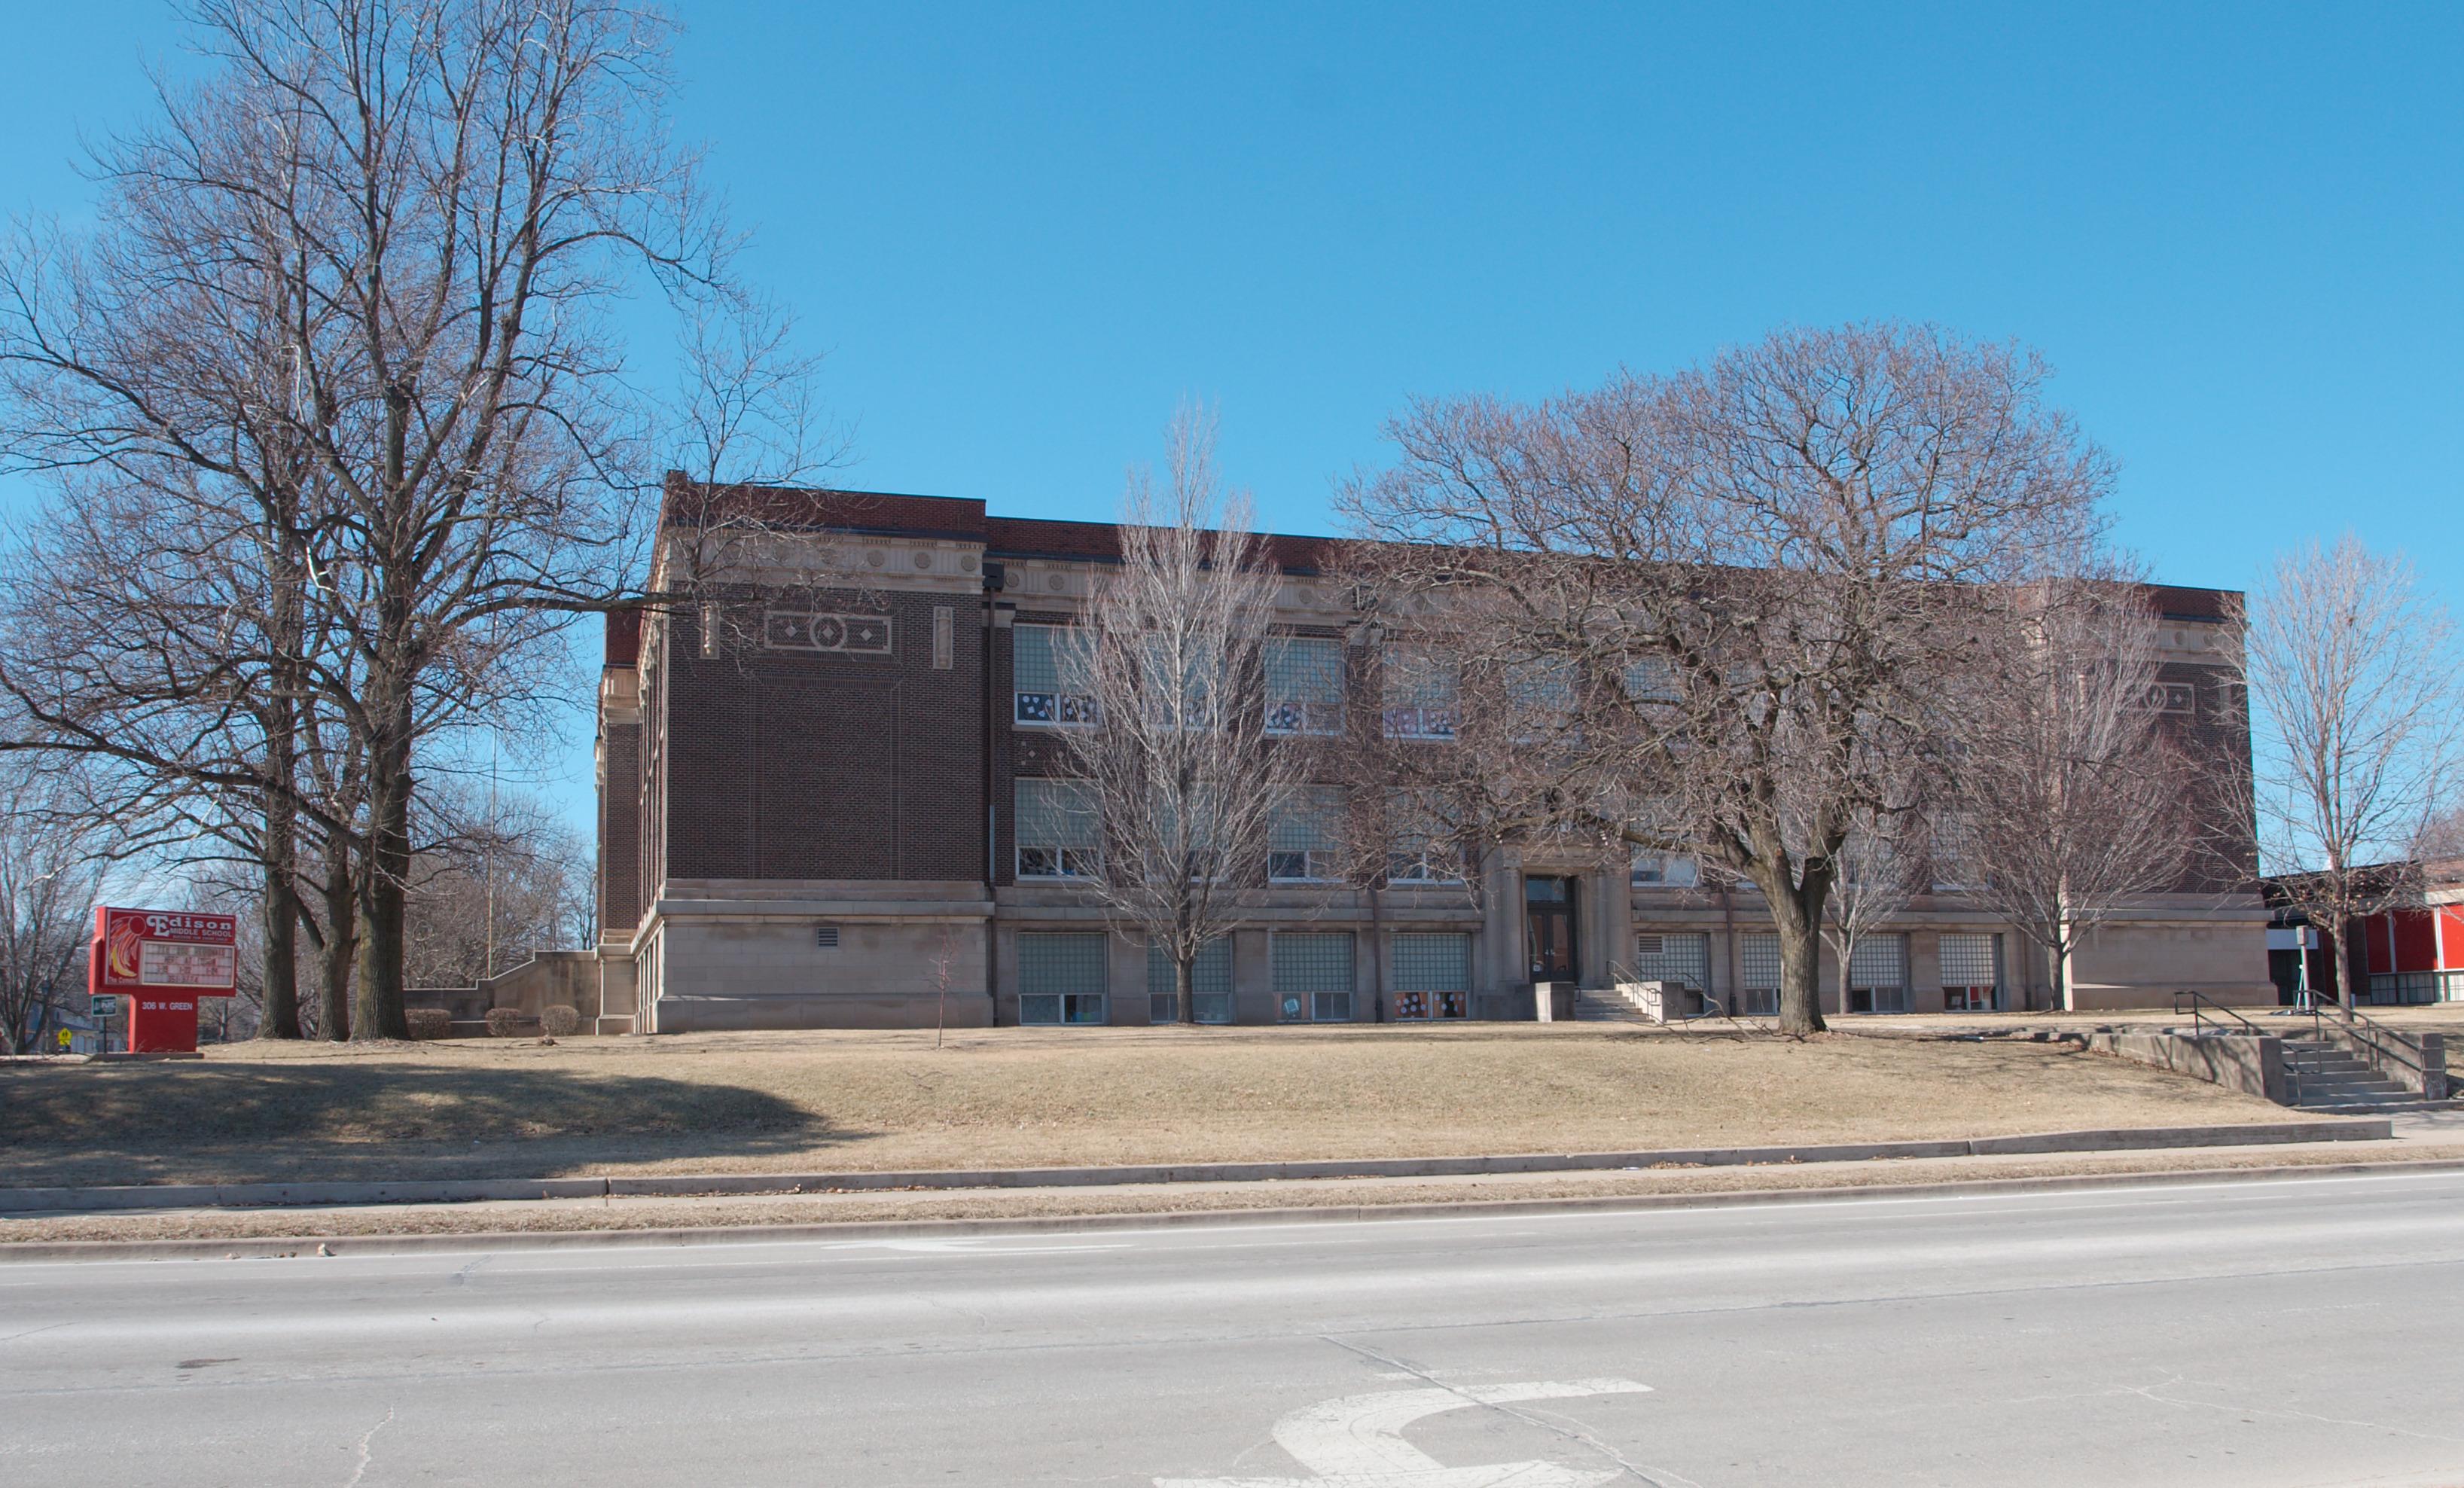 File:Edison Middle School 4078.jpg - Wikimedia Commons